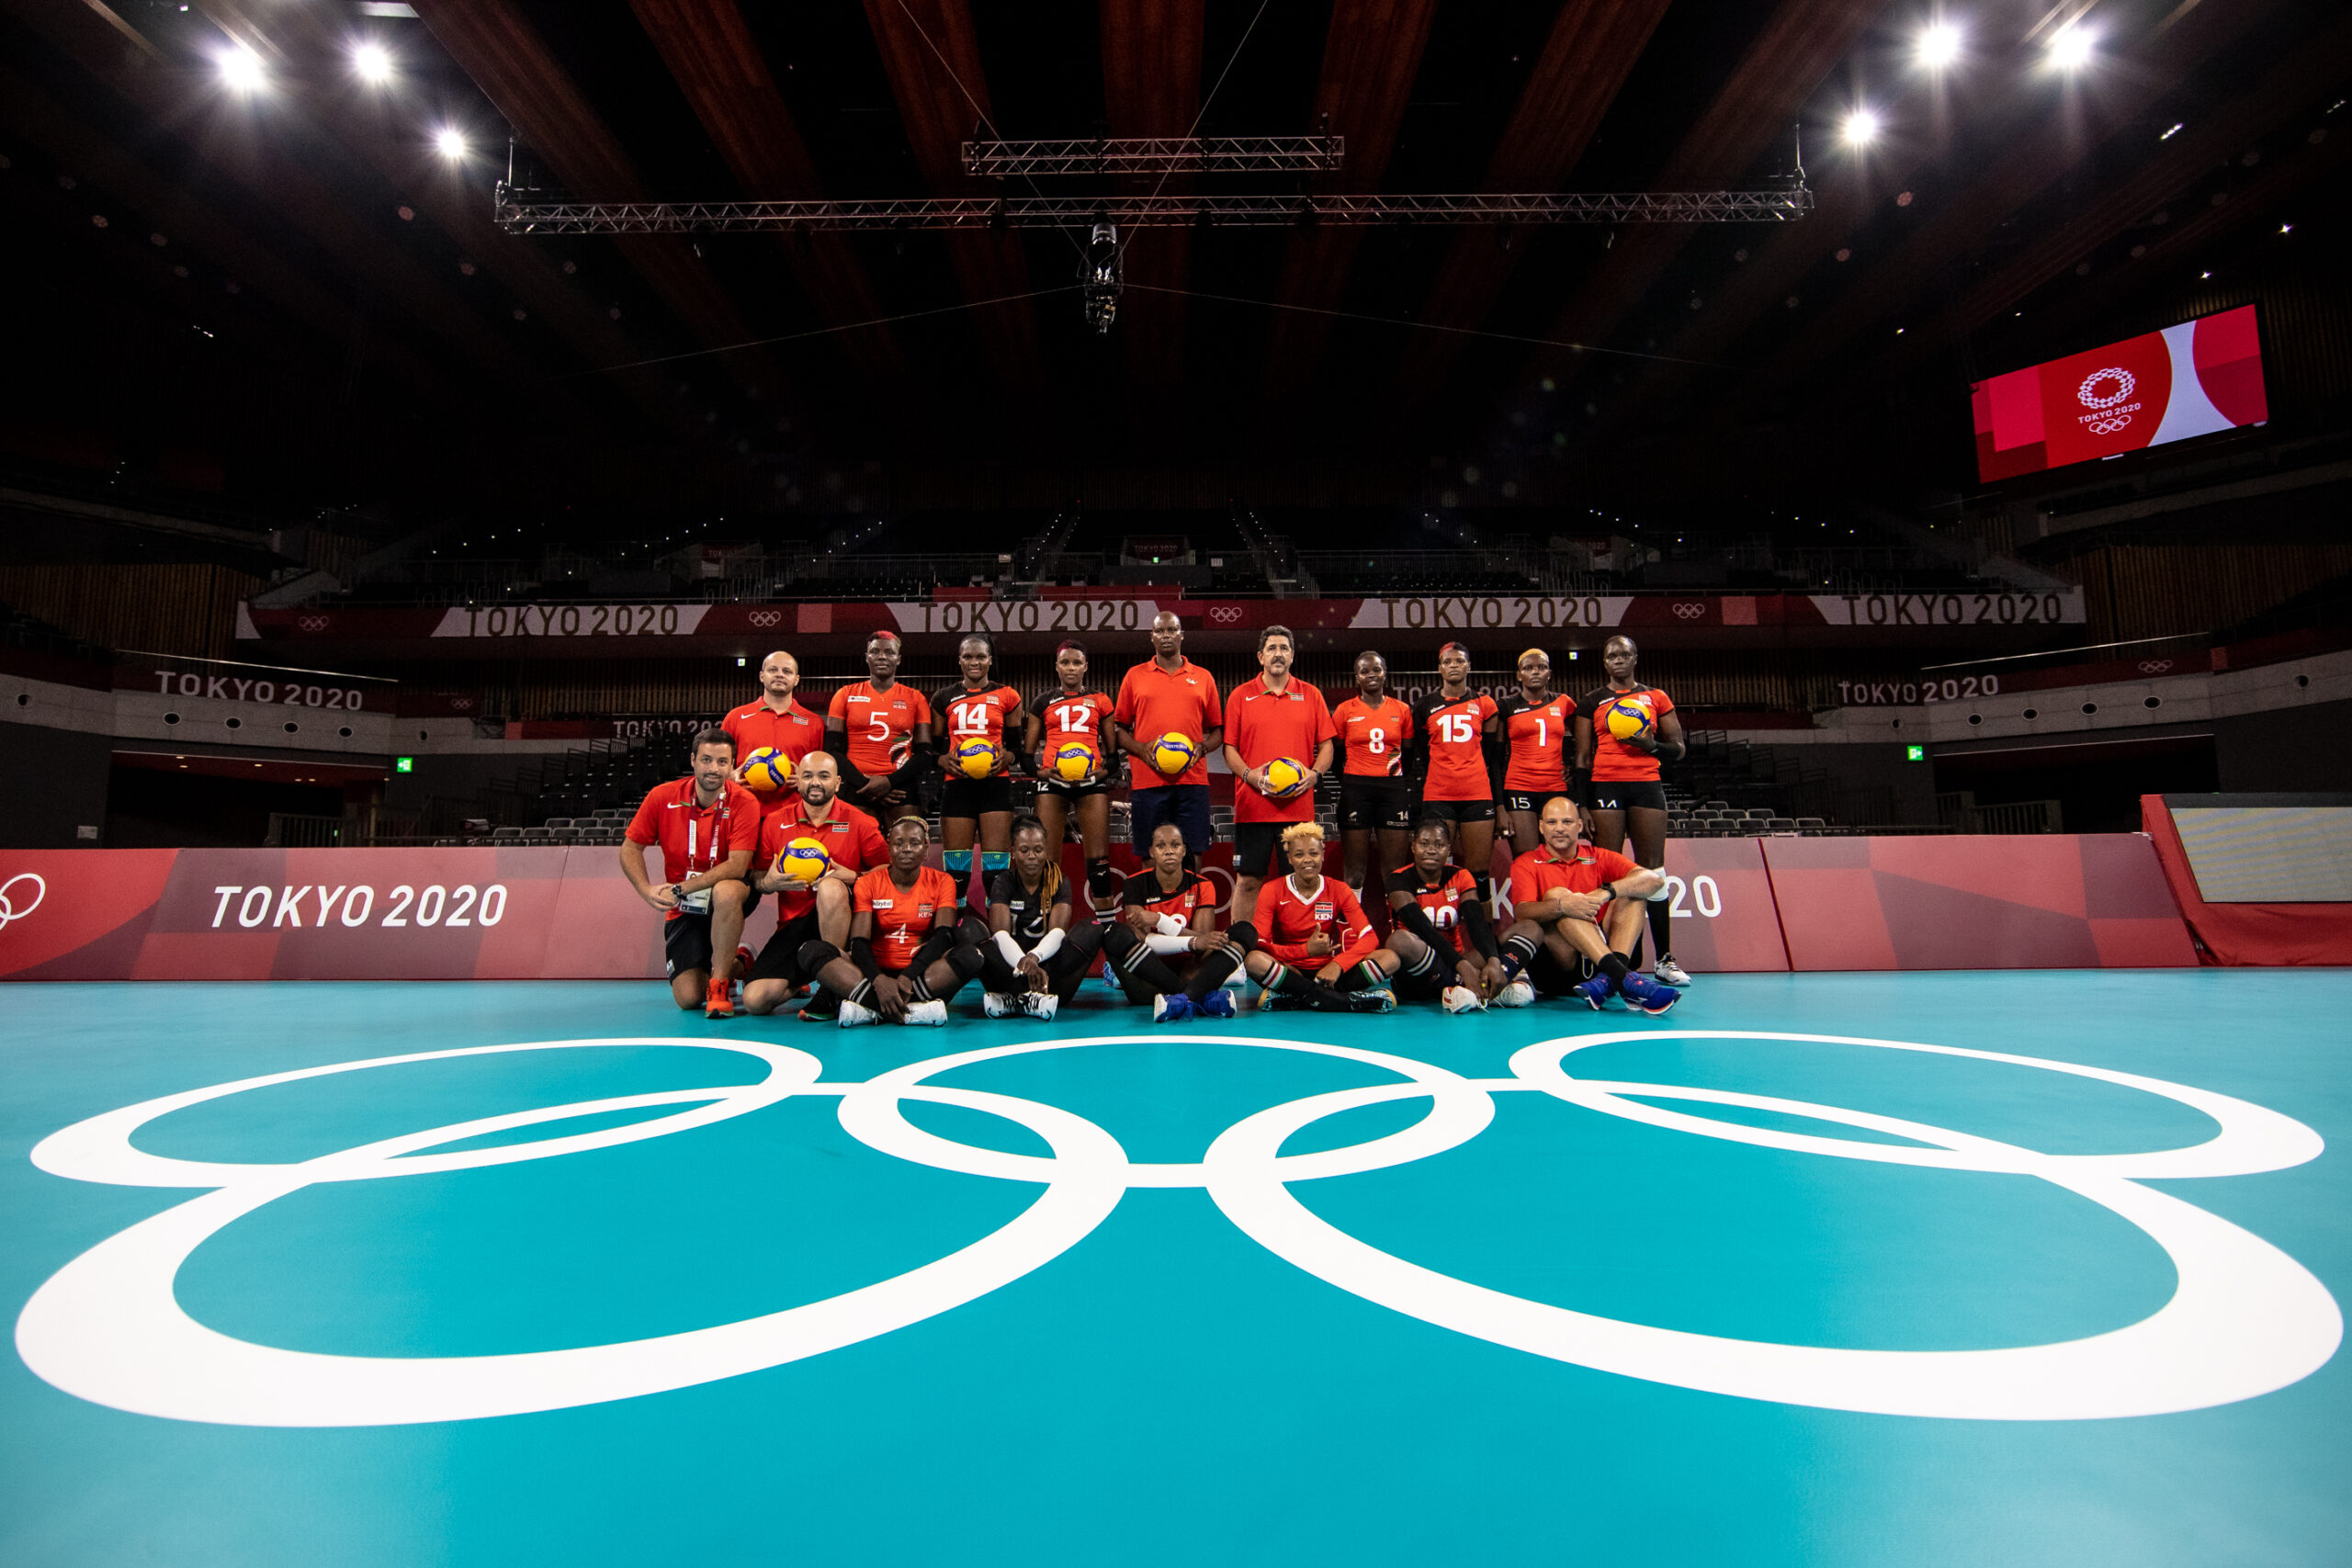 kenya volleyball team players